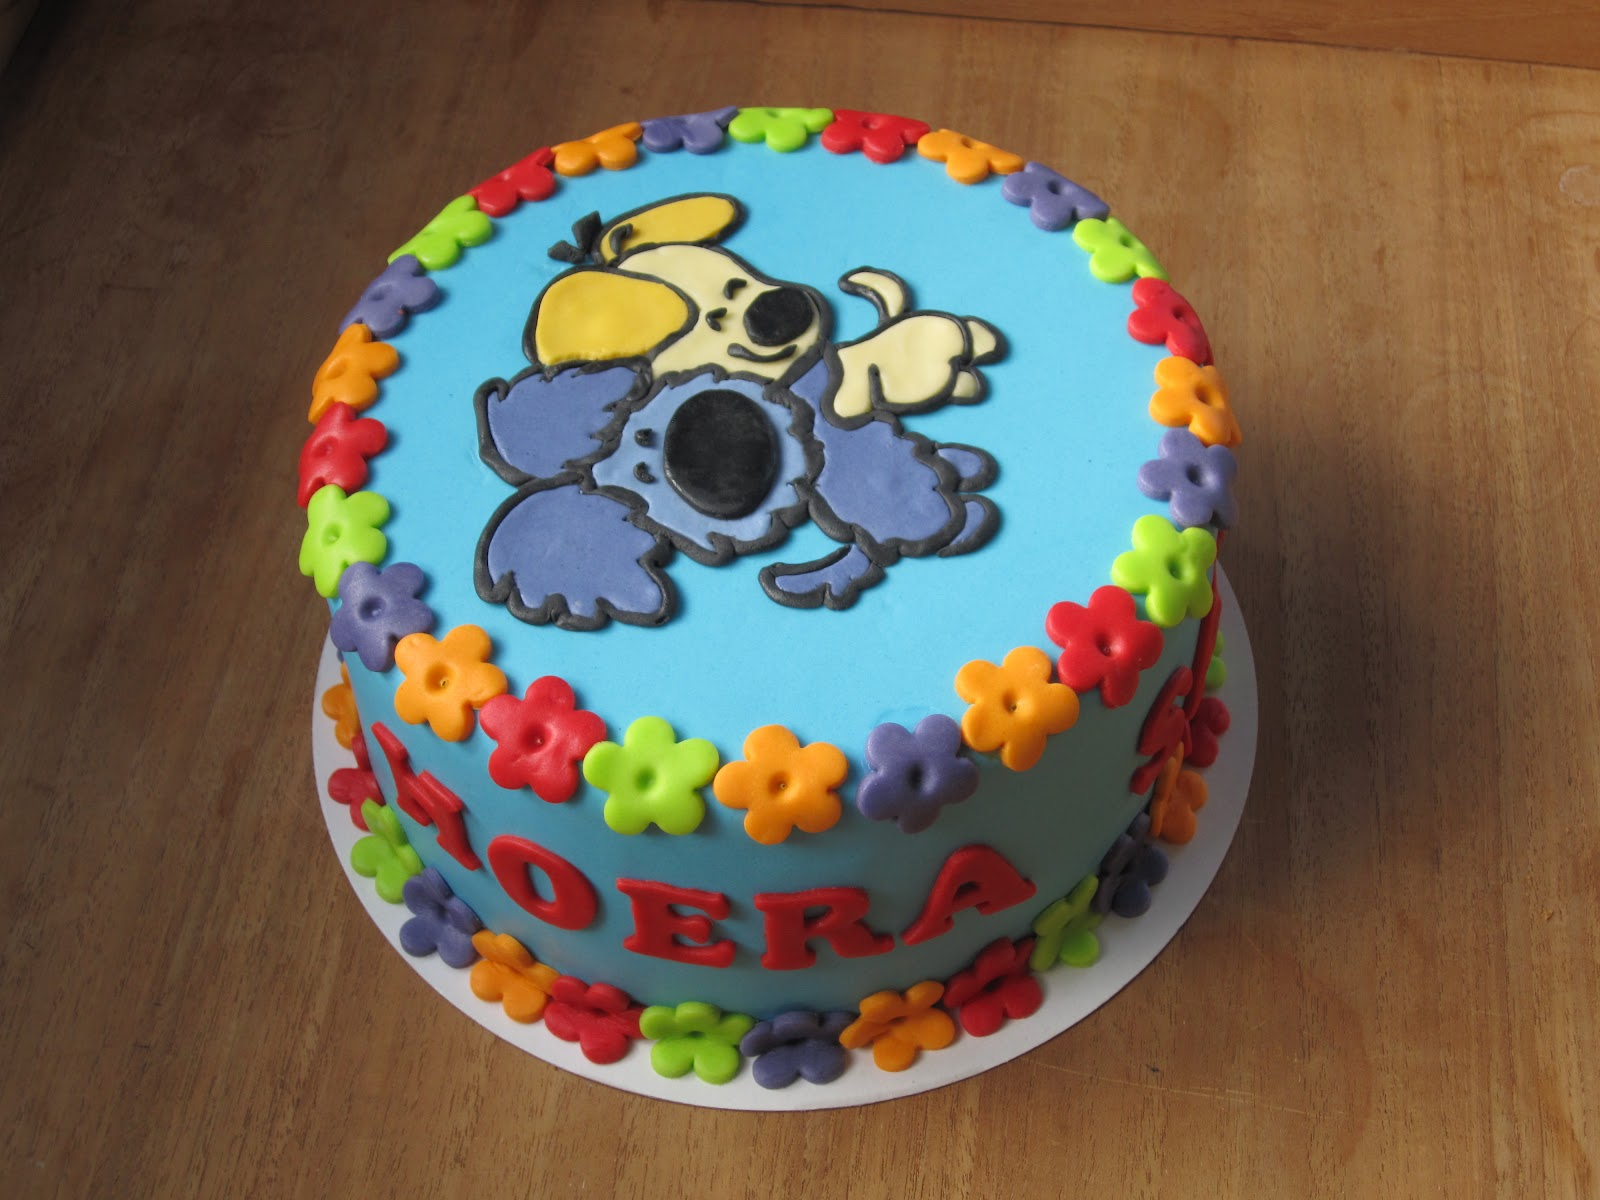 taart 3 jaar Verjaardagstaart Kind 3 Jaar   ARCHIDEV taart 3 jaar